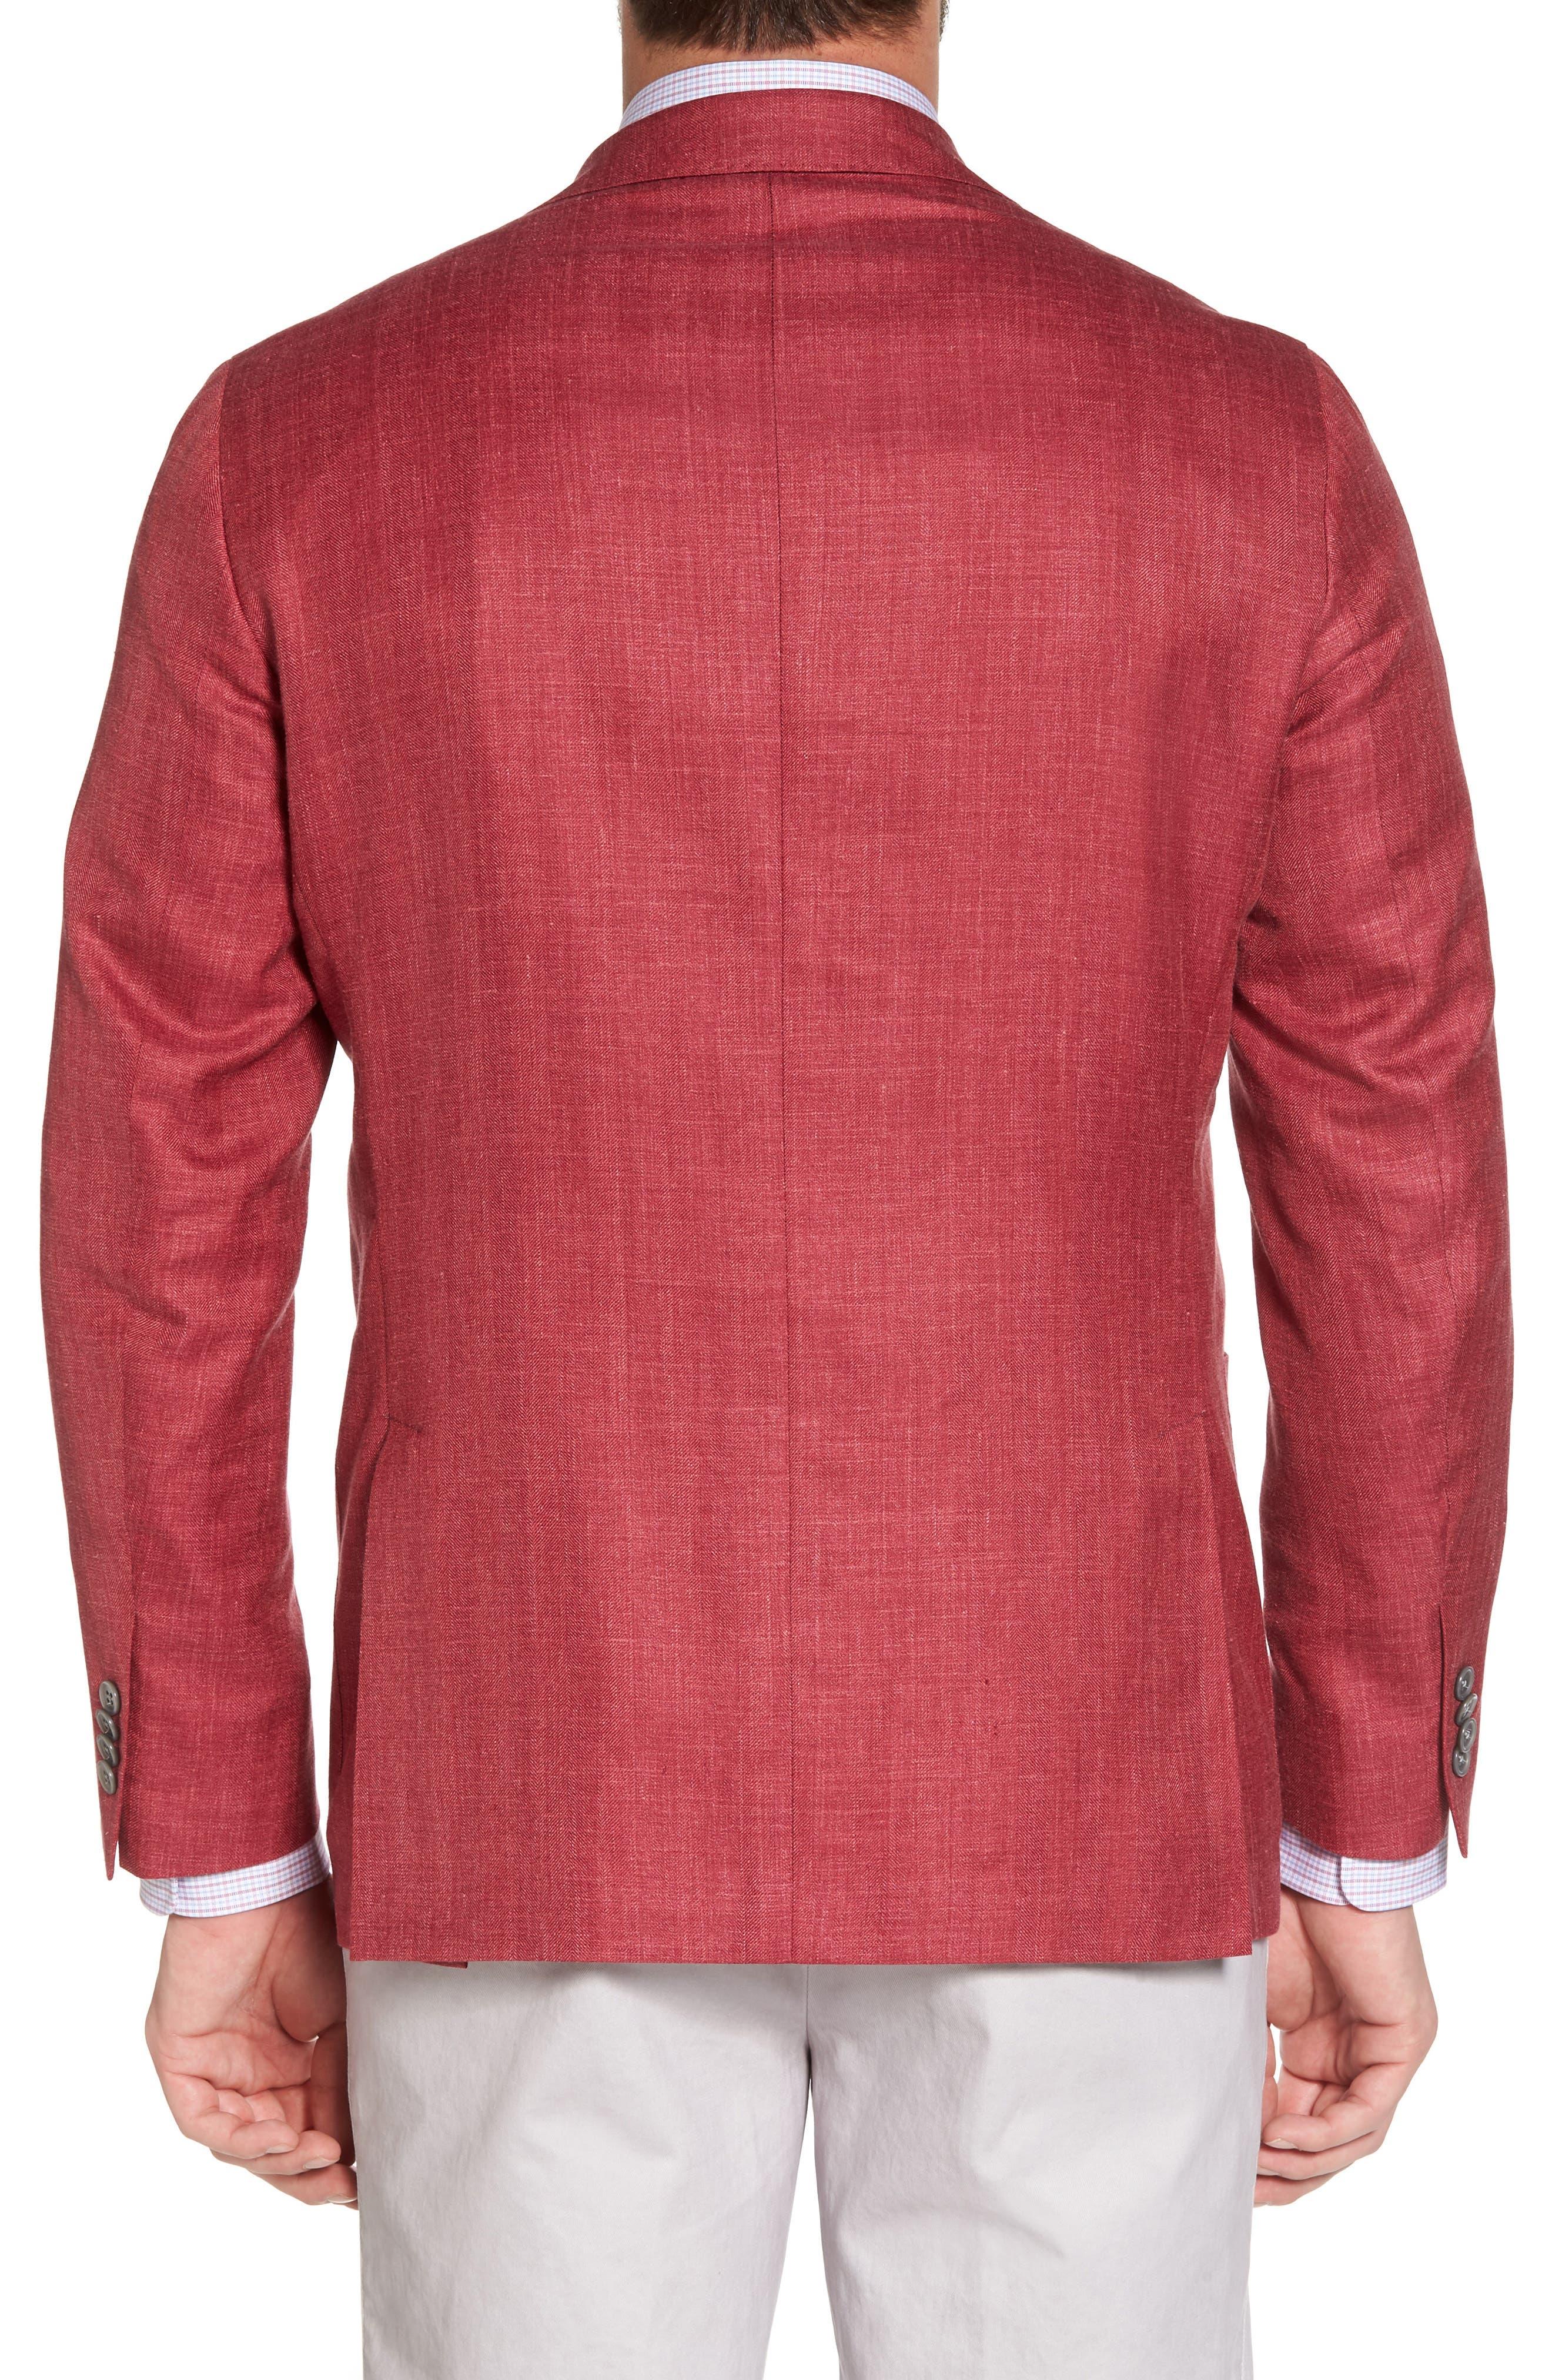 Aiden Classic Fit Wool Blend Blazer,                             Alternate thumbnail 2, color,                             600